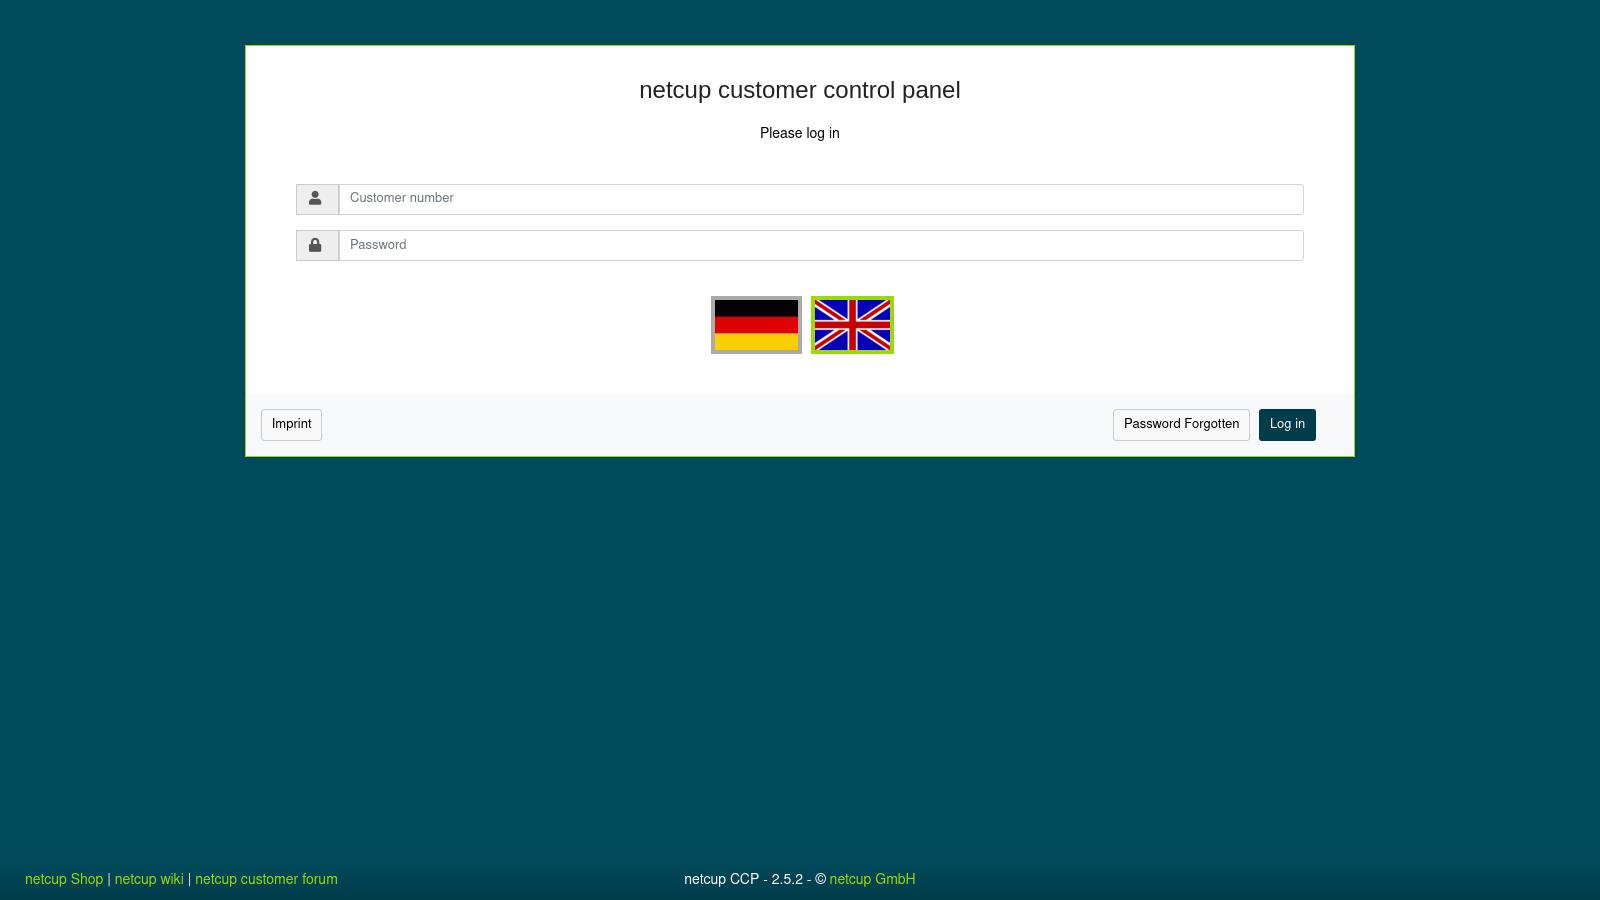 Netcup Customer Control Panel Login